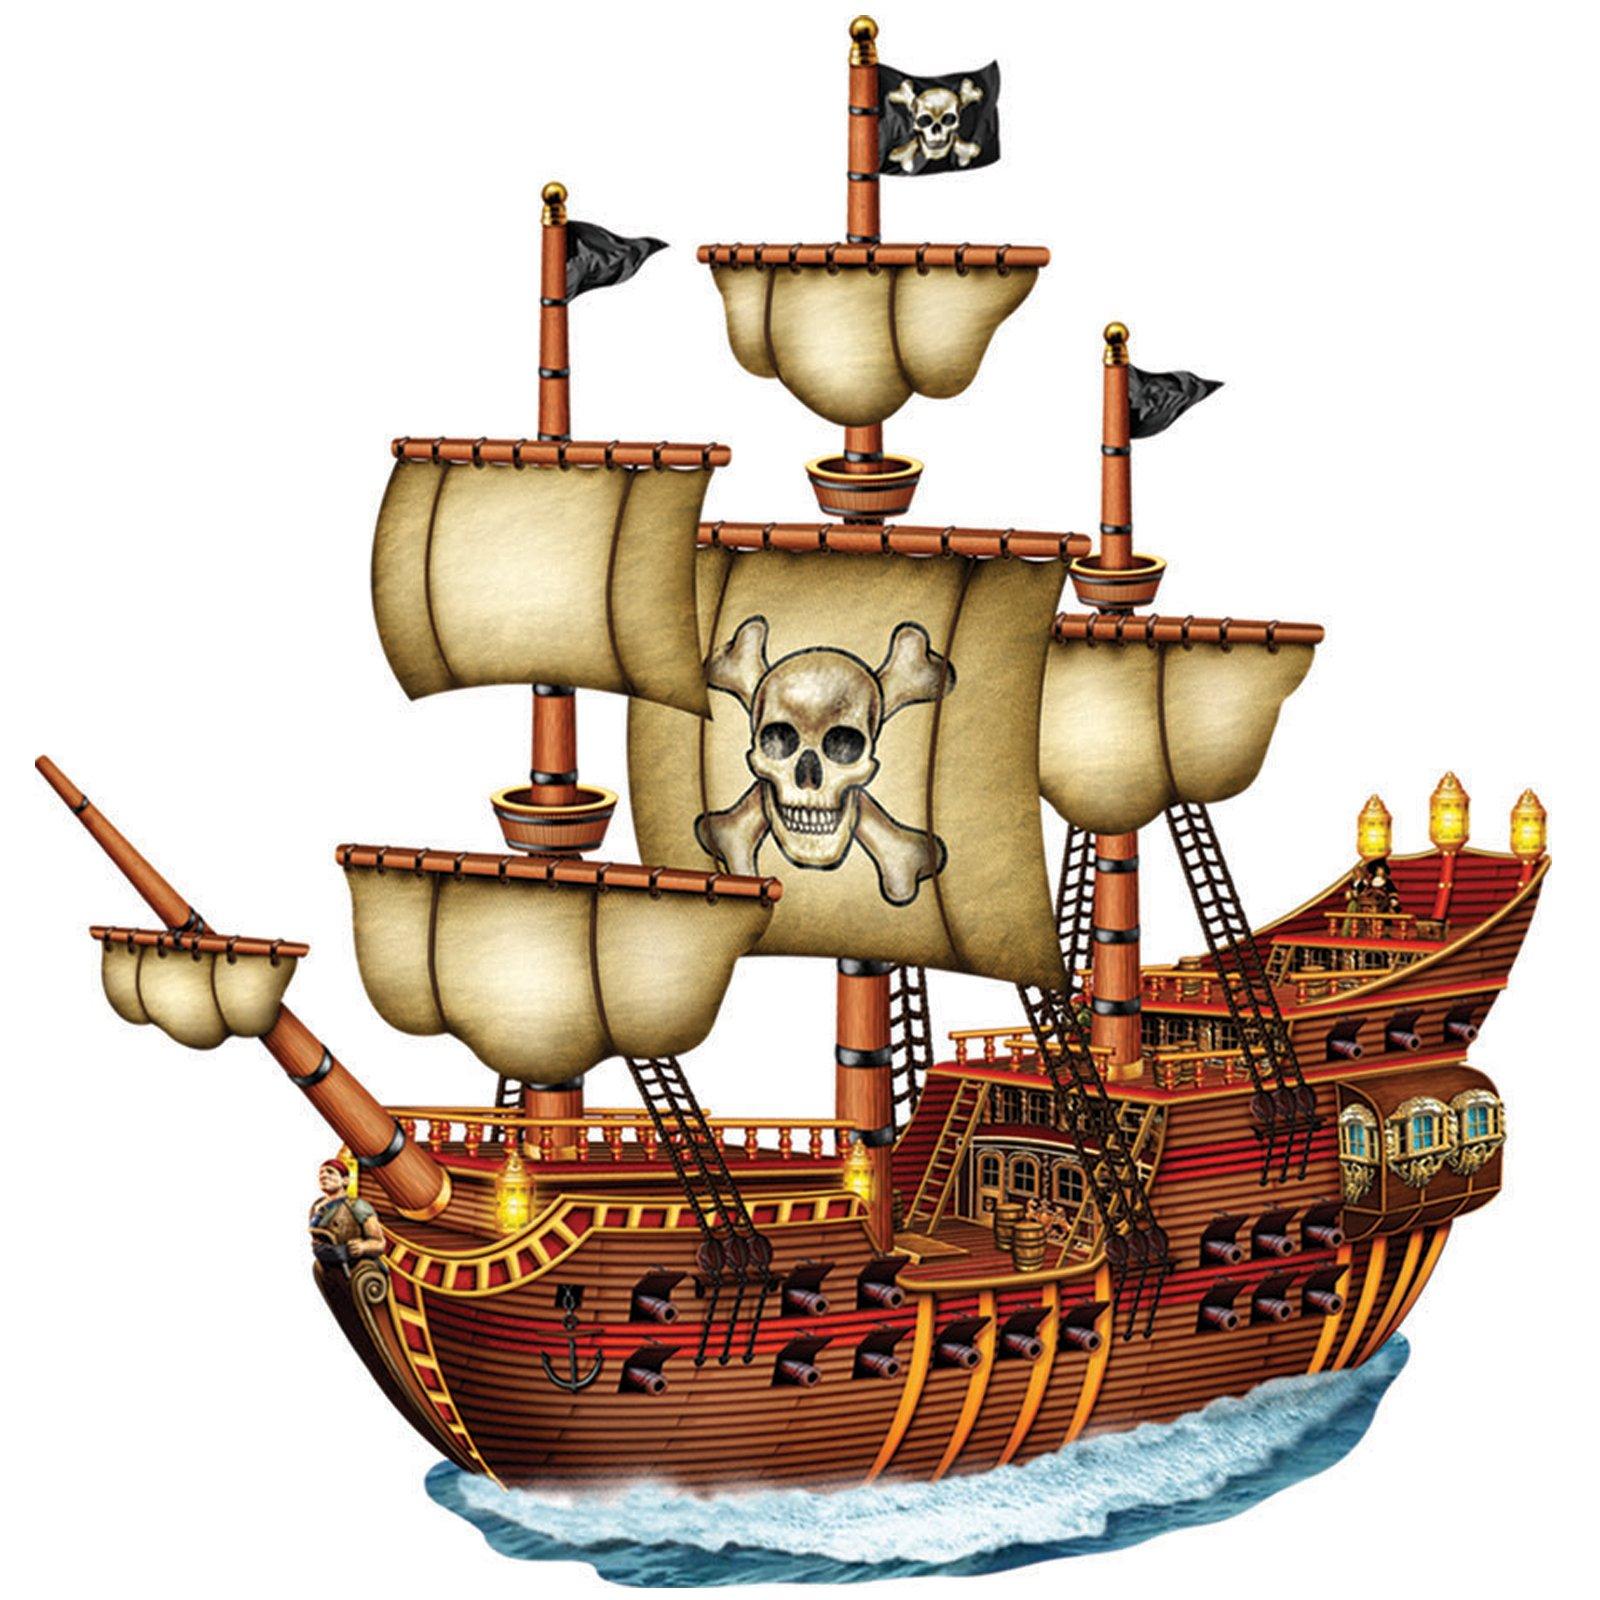 1600x1600 Clipart Pirate Ship